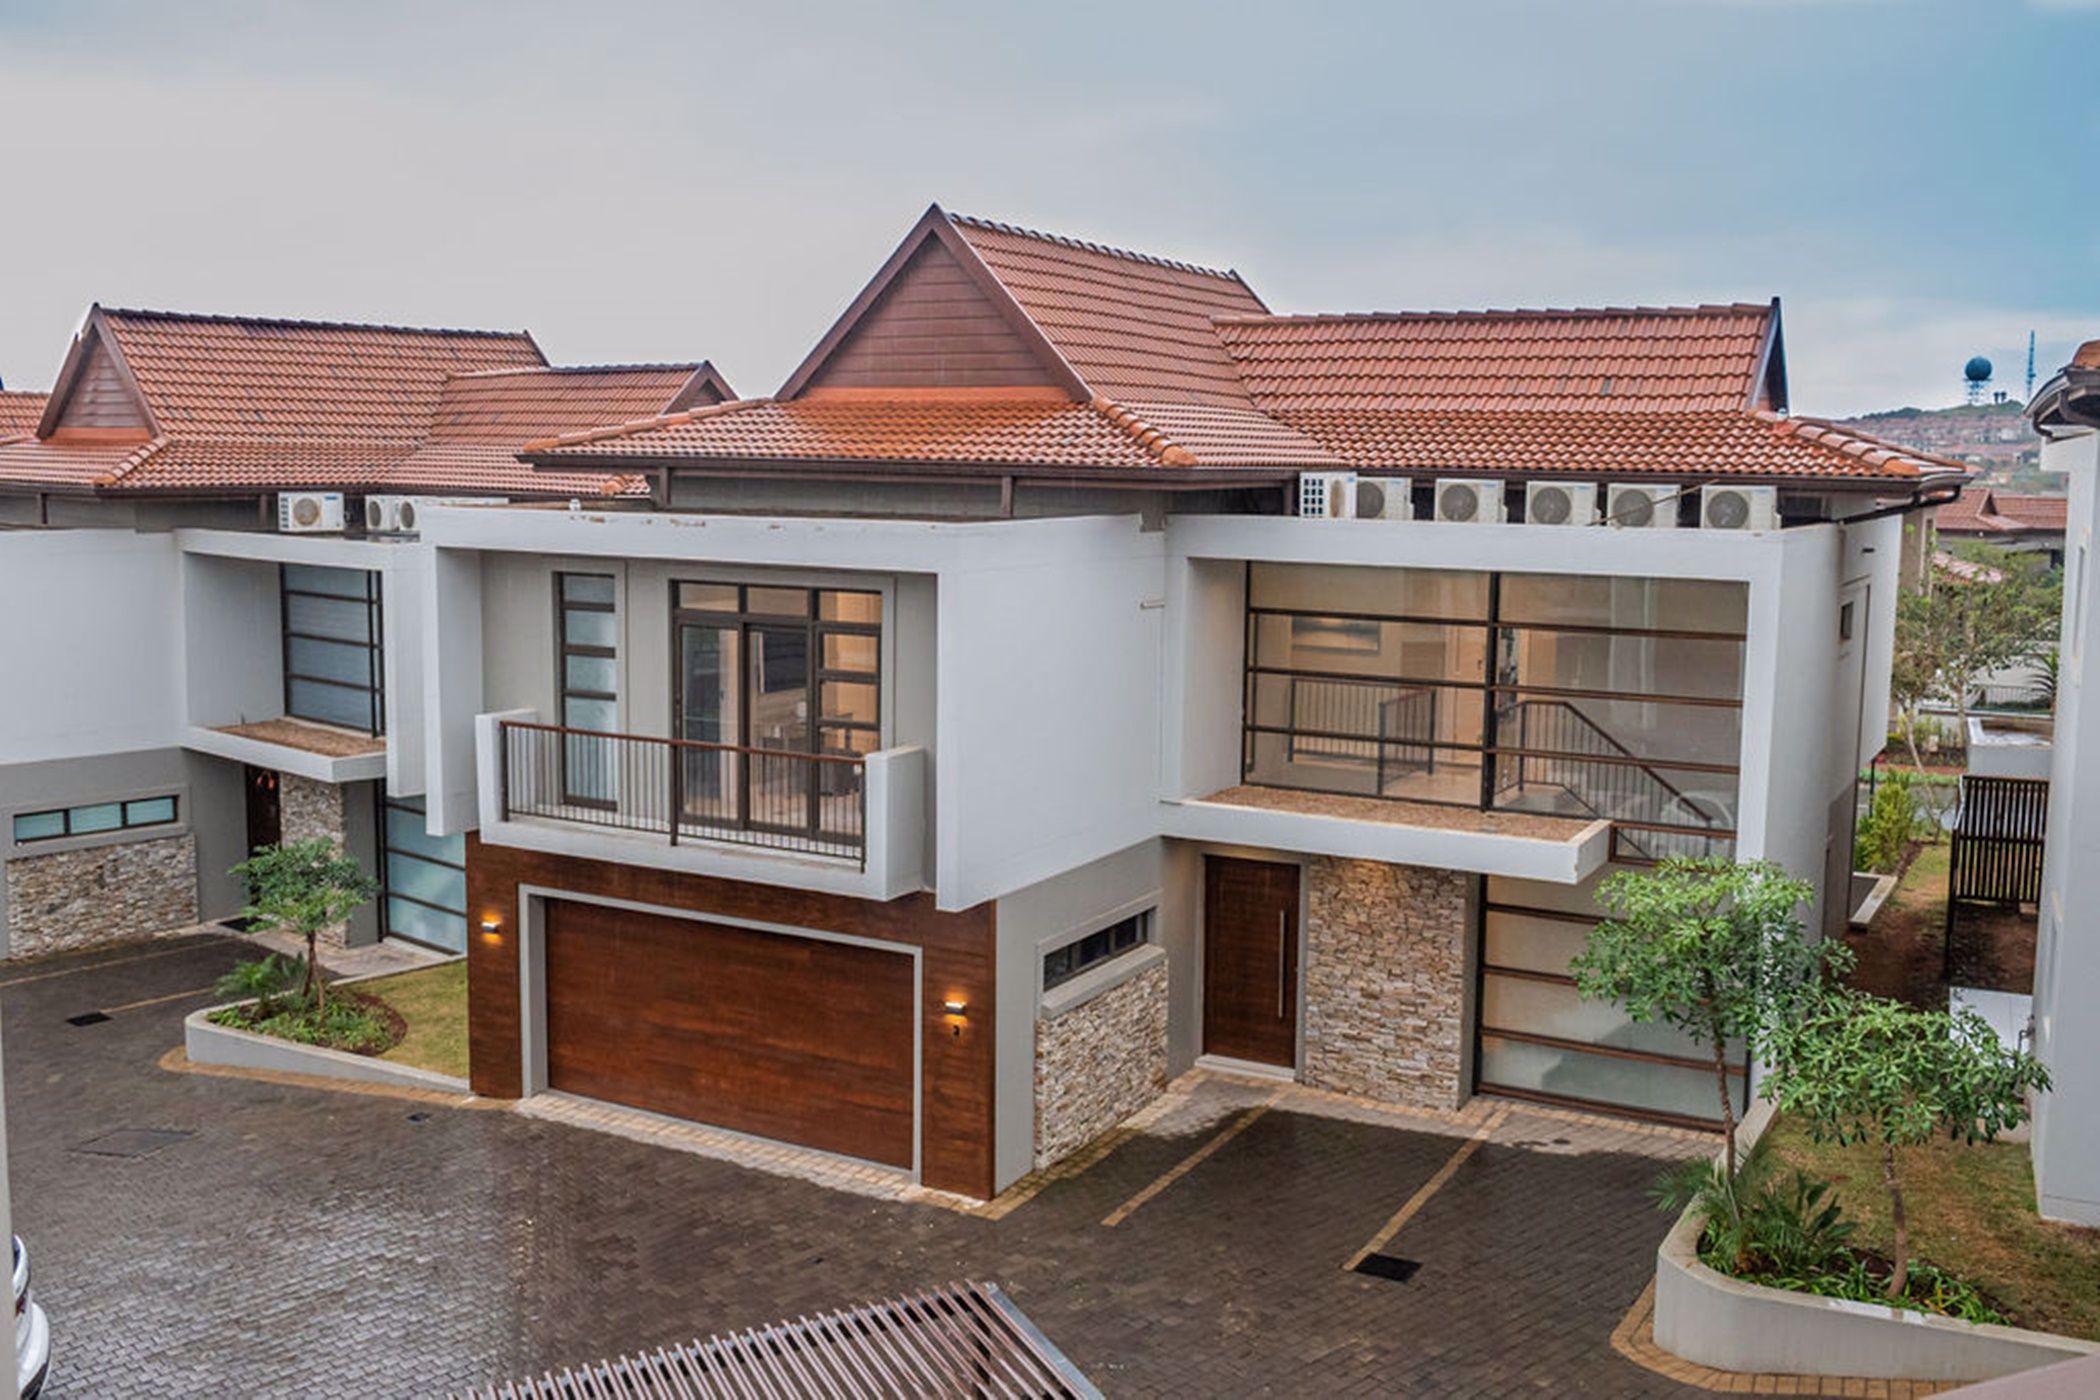 4 bedroom apartment to rent in Izinga